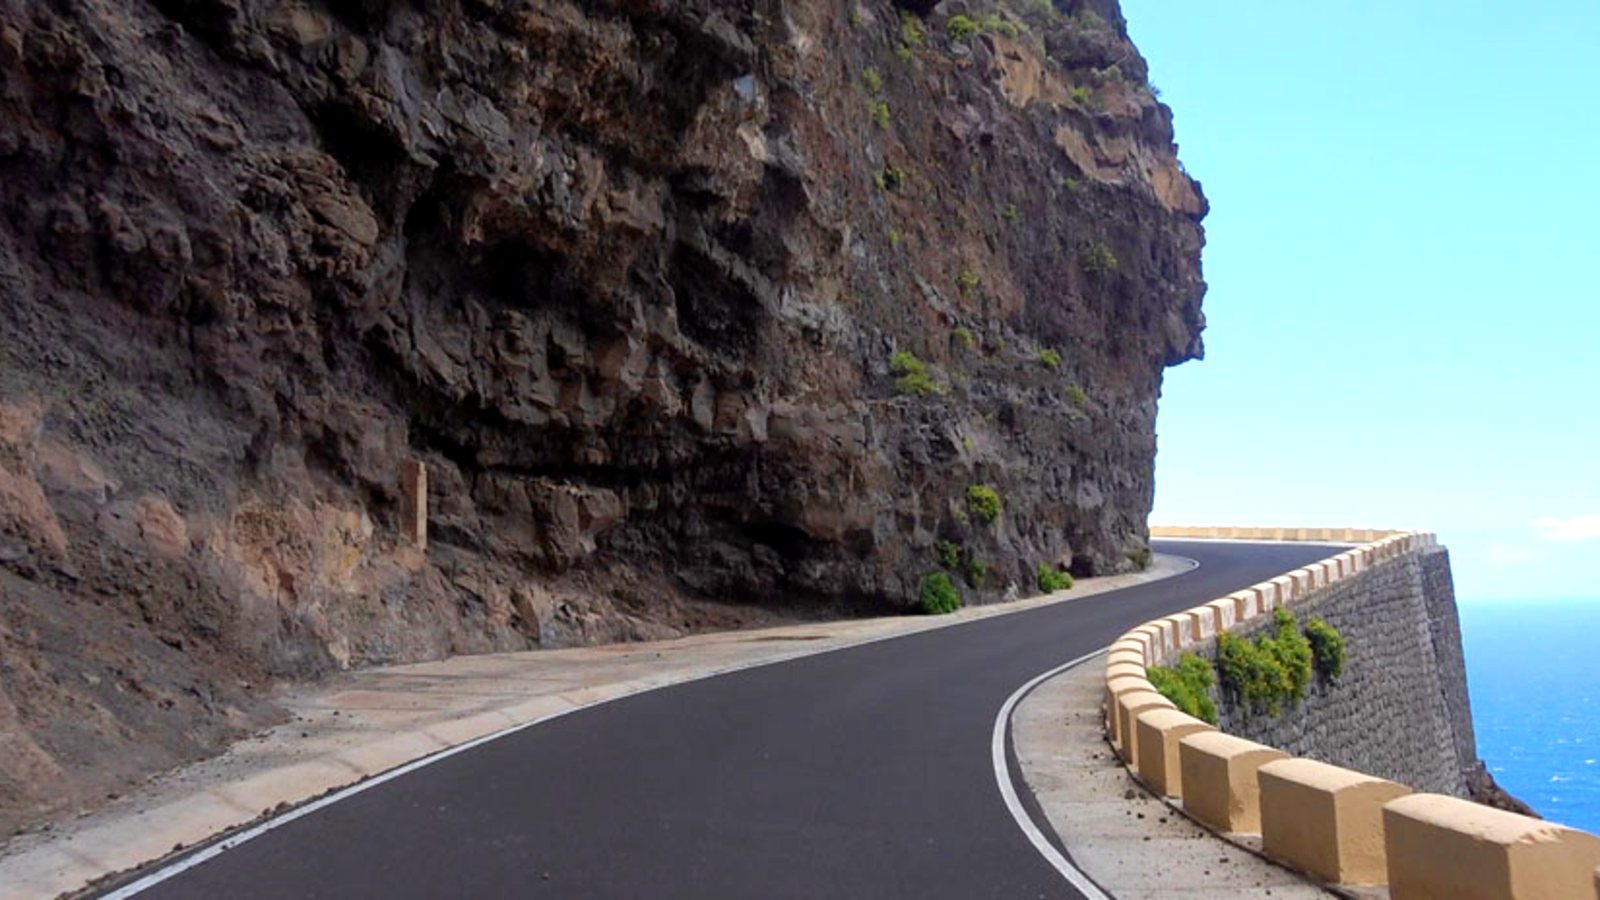 Estrecha carretera de costa de Buenavista del Norte a la Punta de Teno